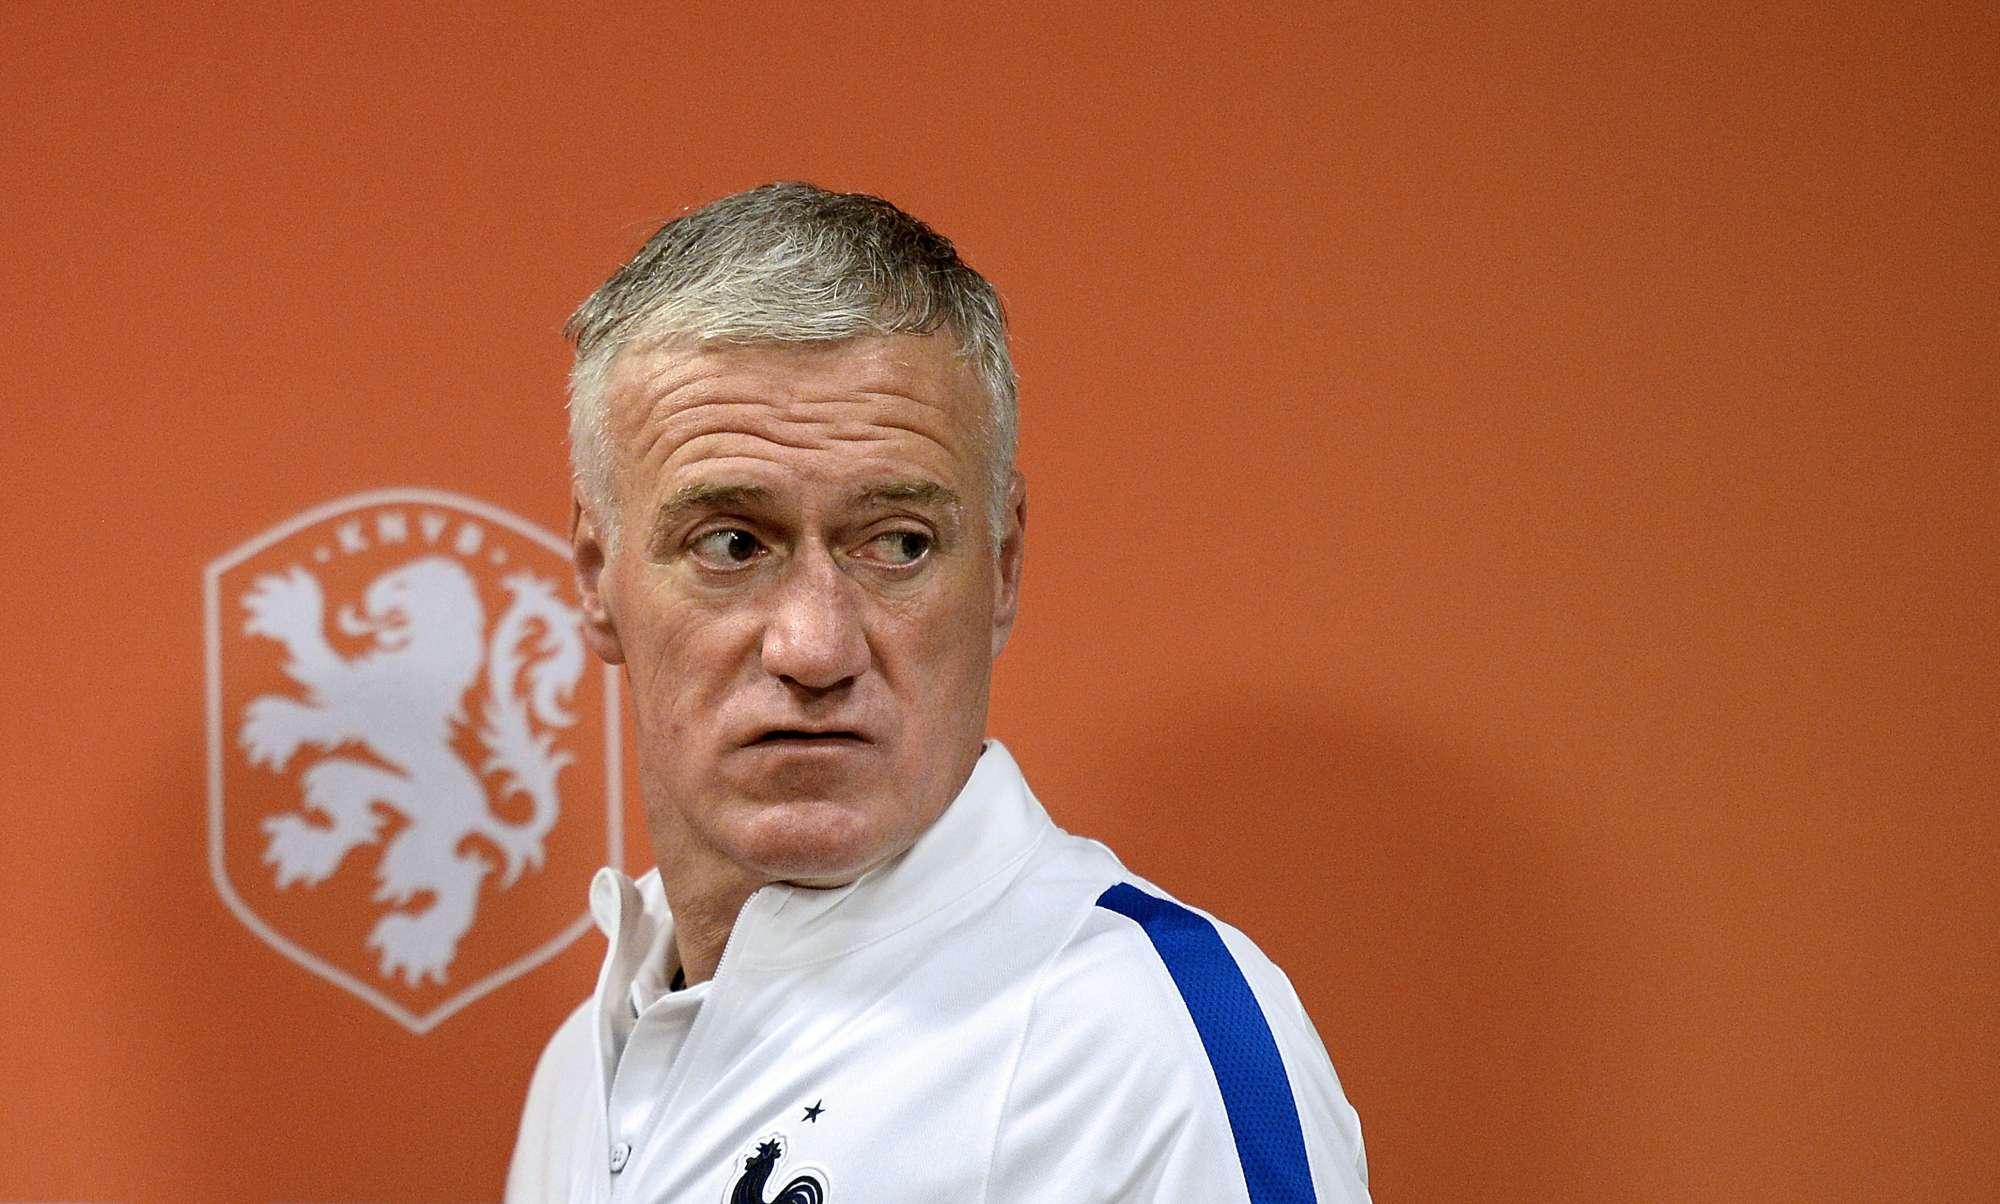 Didier Deschamps, tecnico della Francia dal 2012